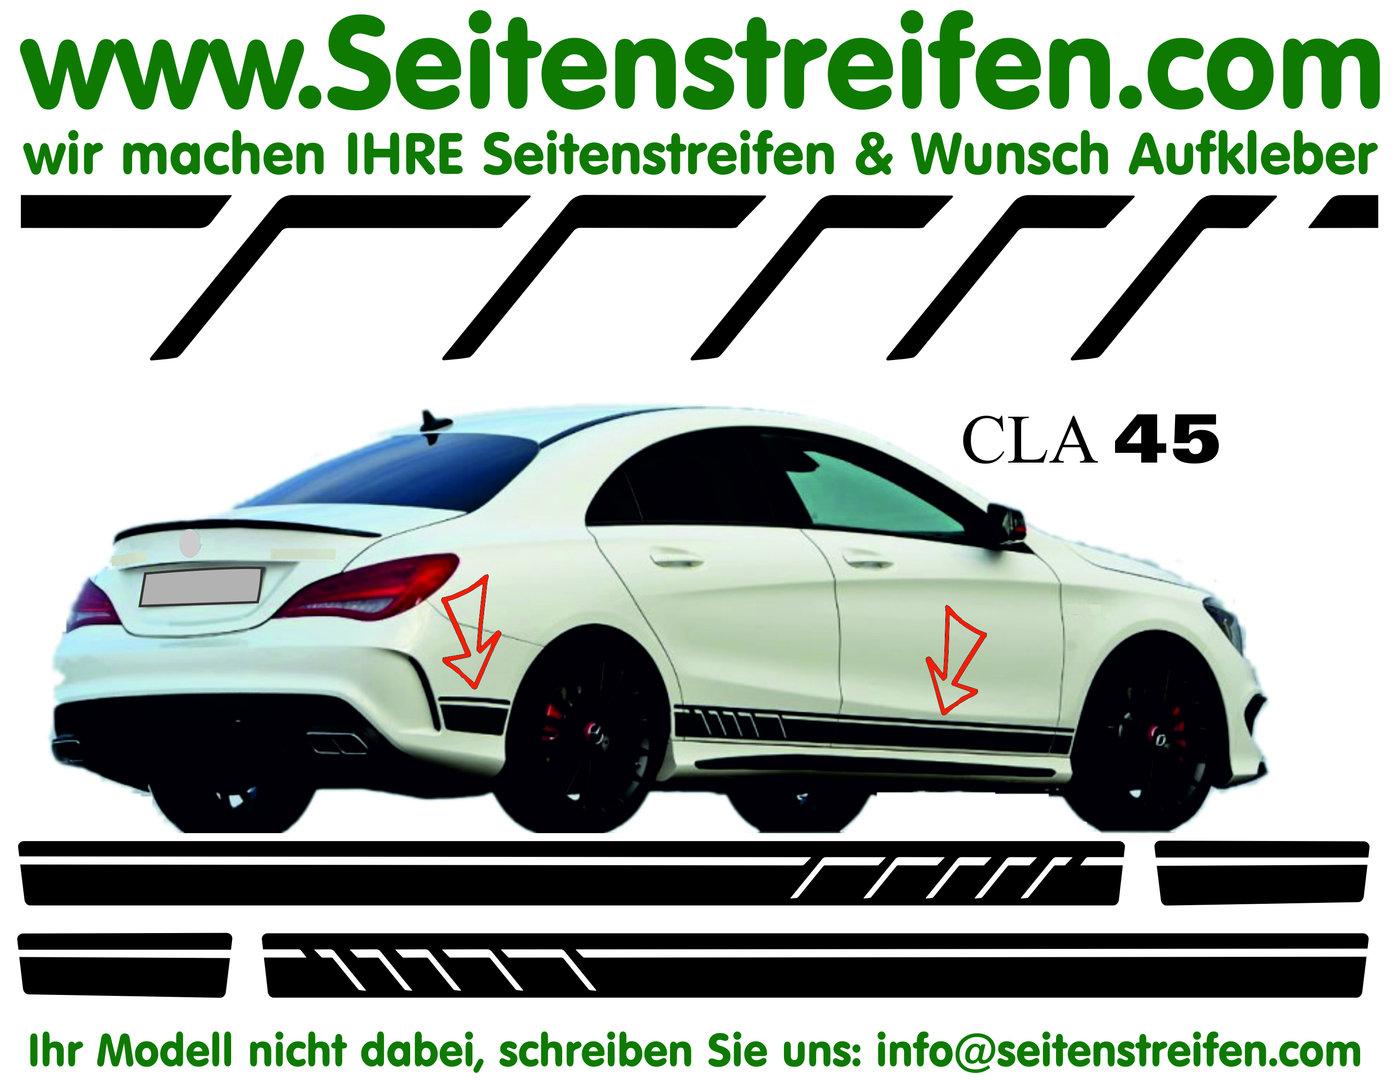 Mercedes Benz Cla Cla Shooting Brake Amg Replika Seitenstreifen Dekor Aufkleber Set Artnr 7096